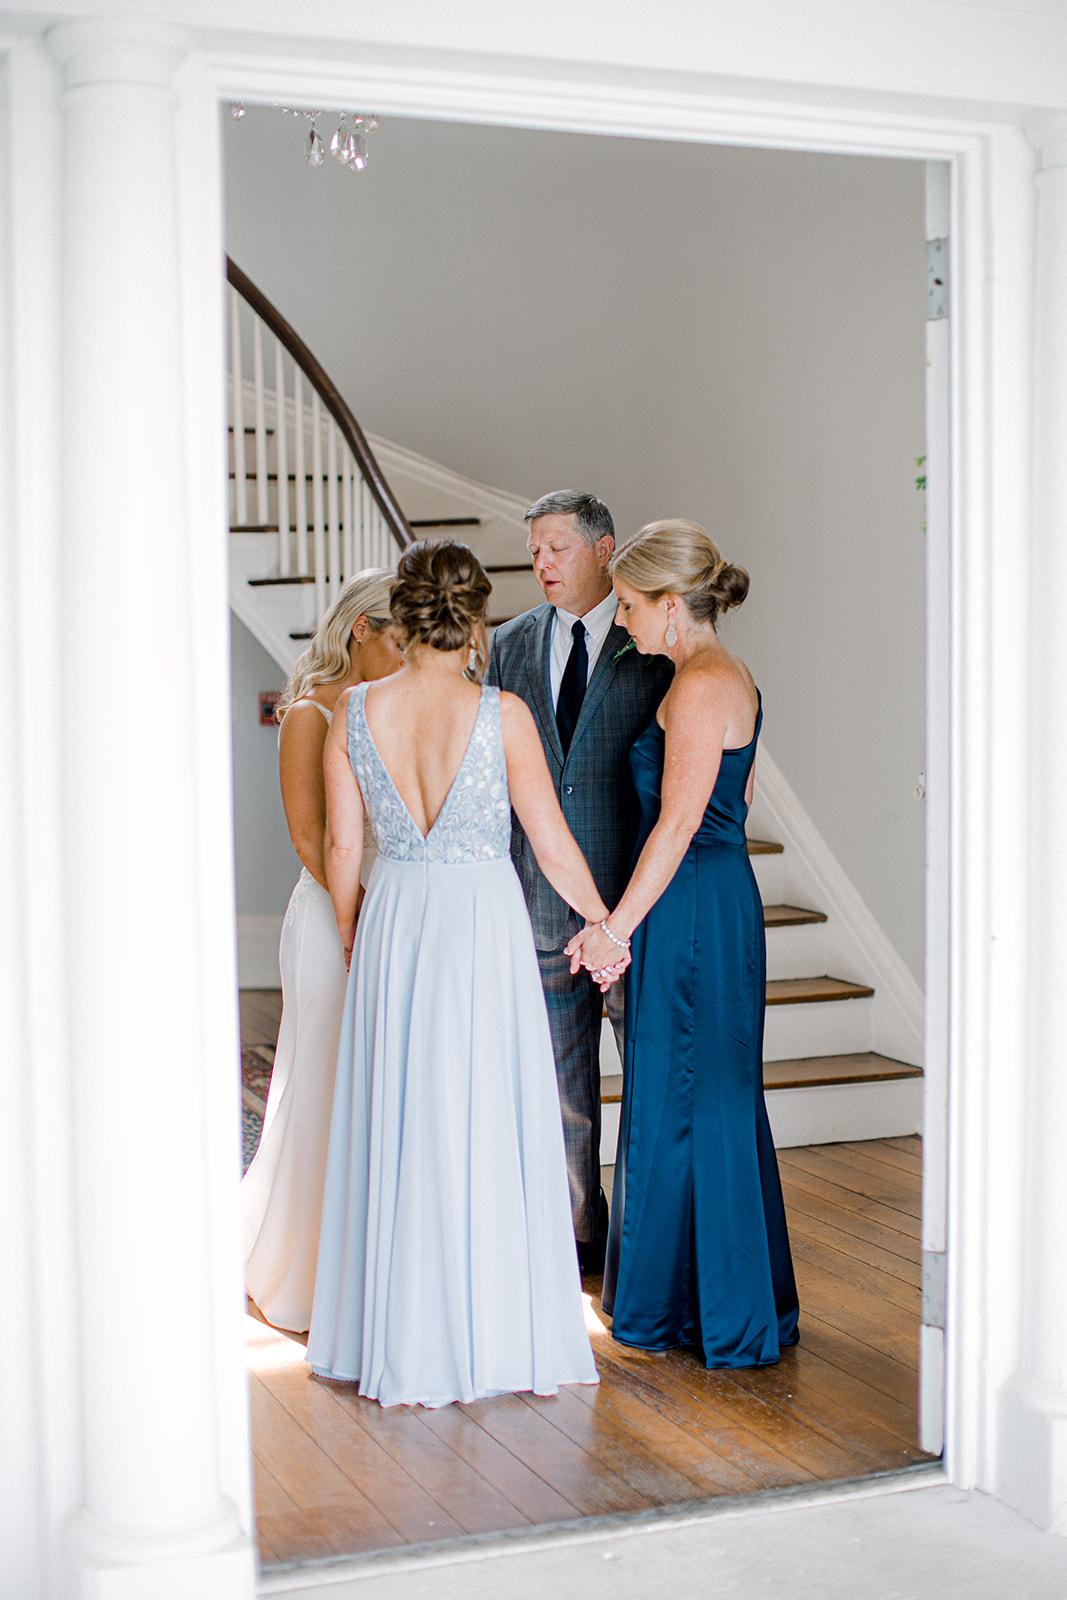 Family prayer before wedding ceremony